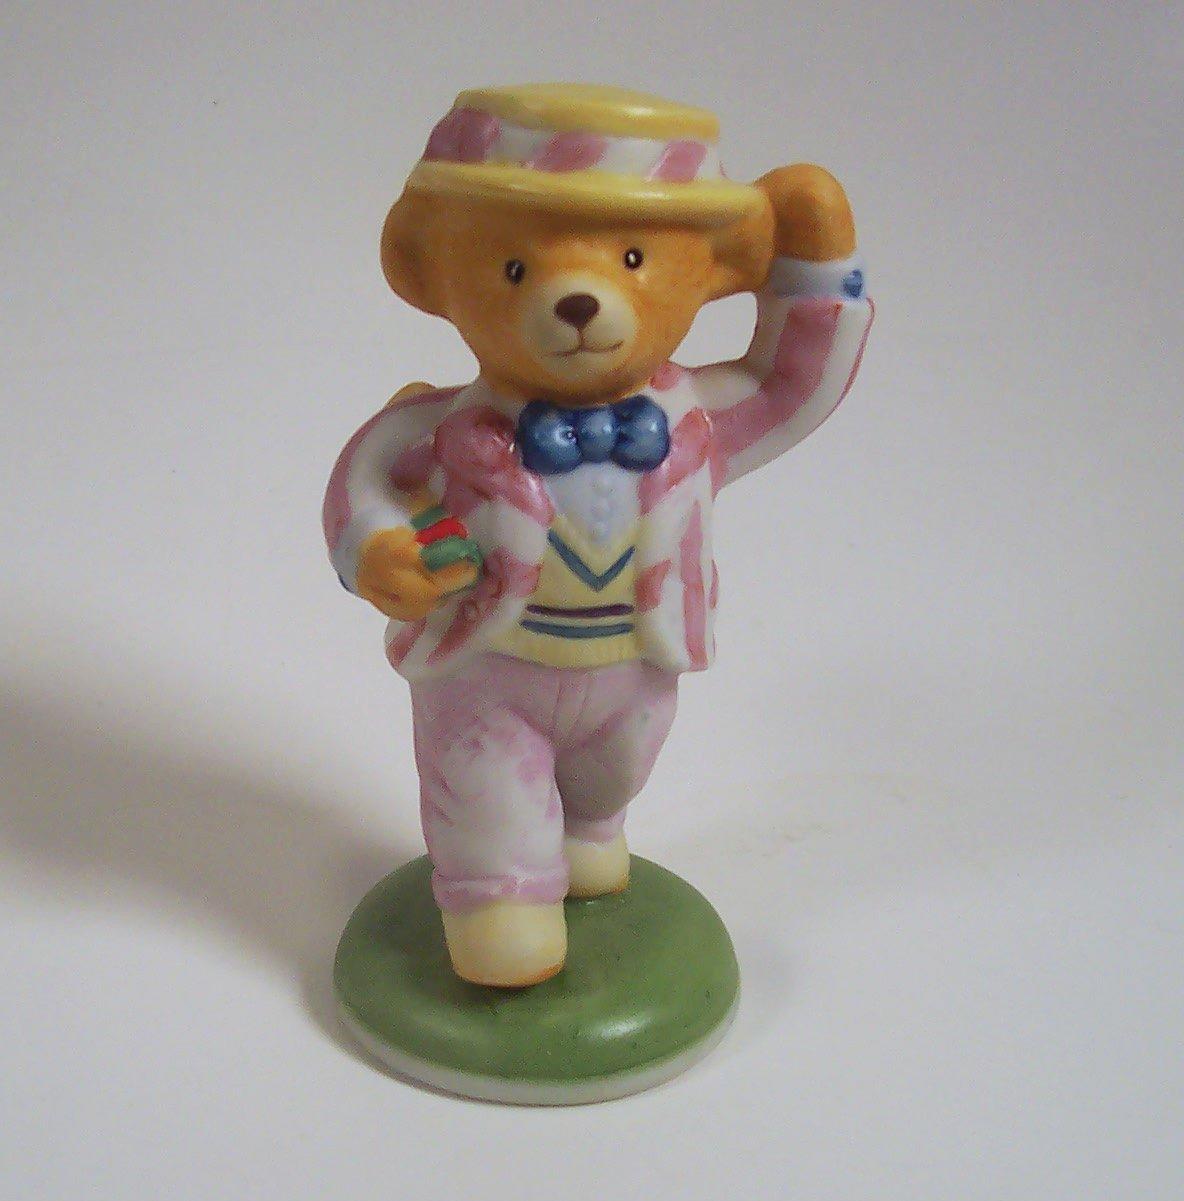 Lord Margate Teddington Hotel 1986 Franklin Mint Porcelain Figurine